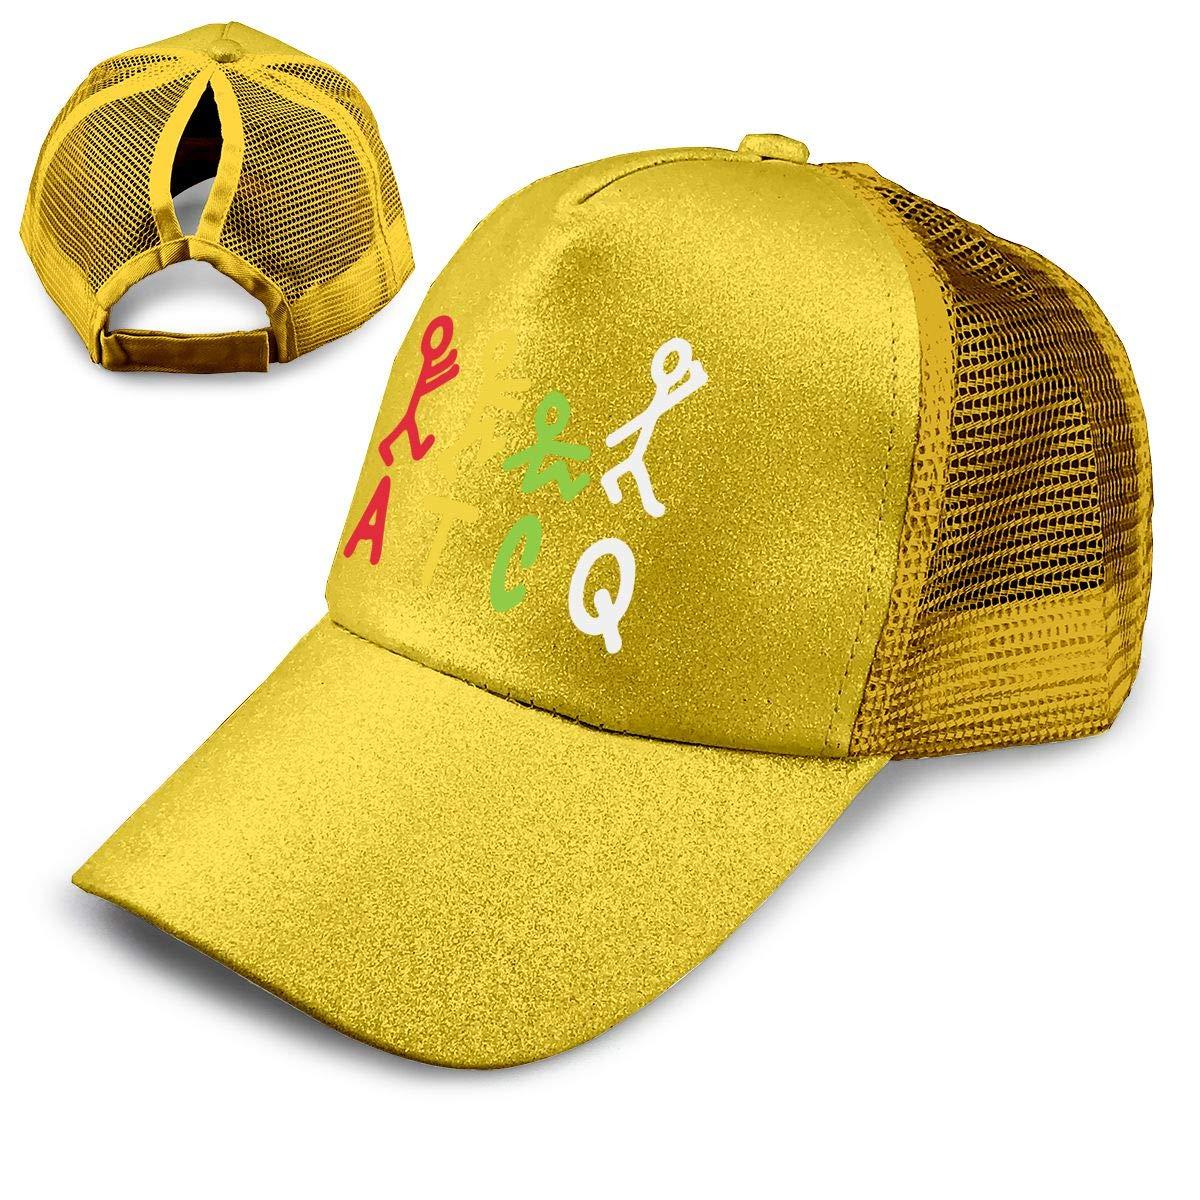 ATCQ Ponytail Messy High Bun Hat Ponycaps Baseball Cap Adjustable Trucker Cap Mesh Cap